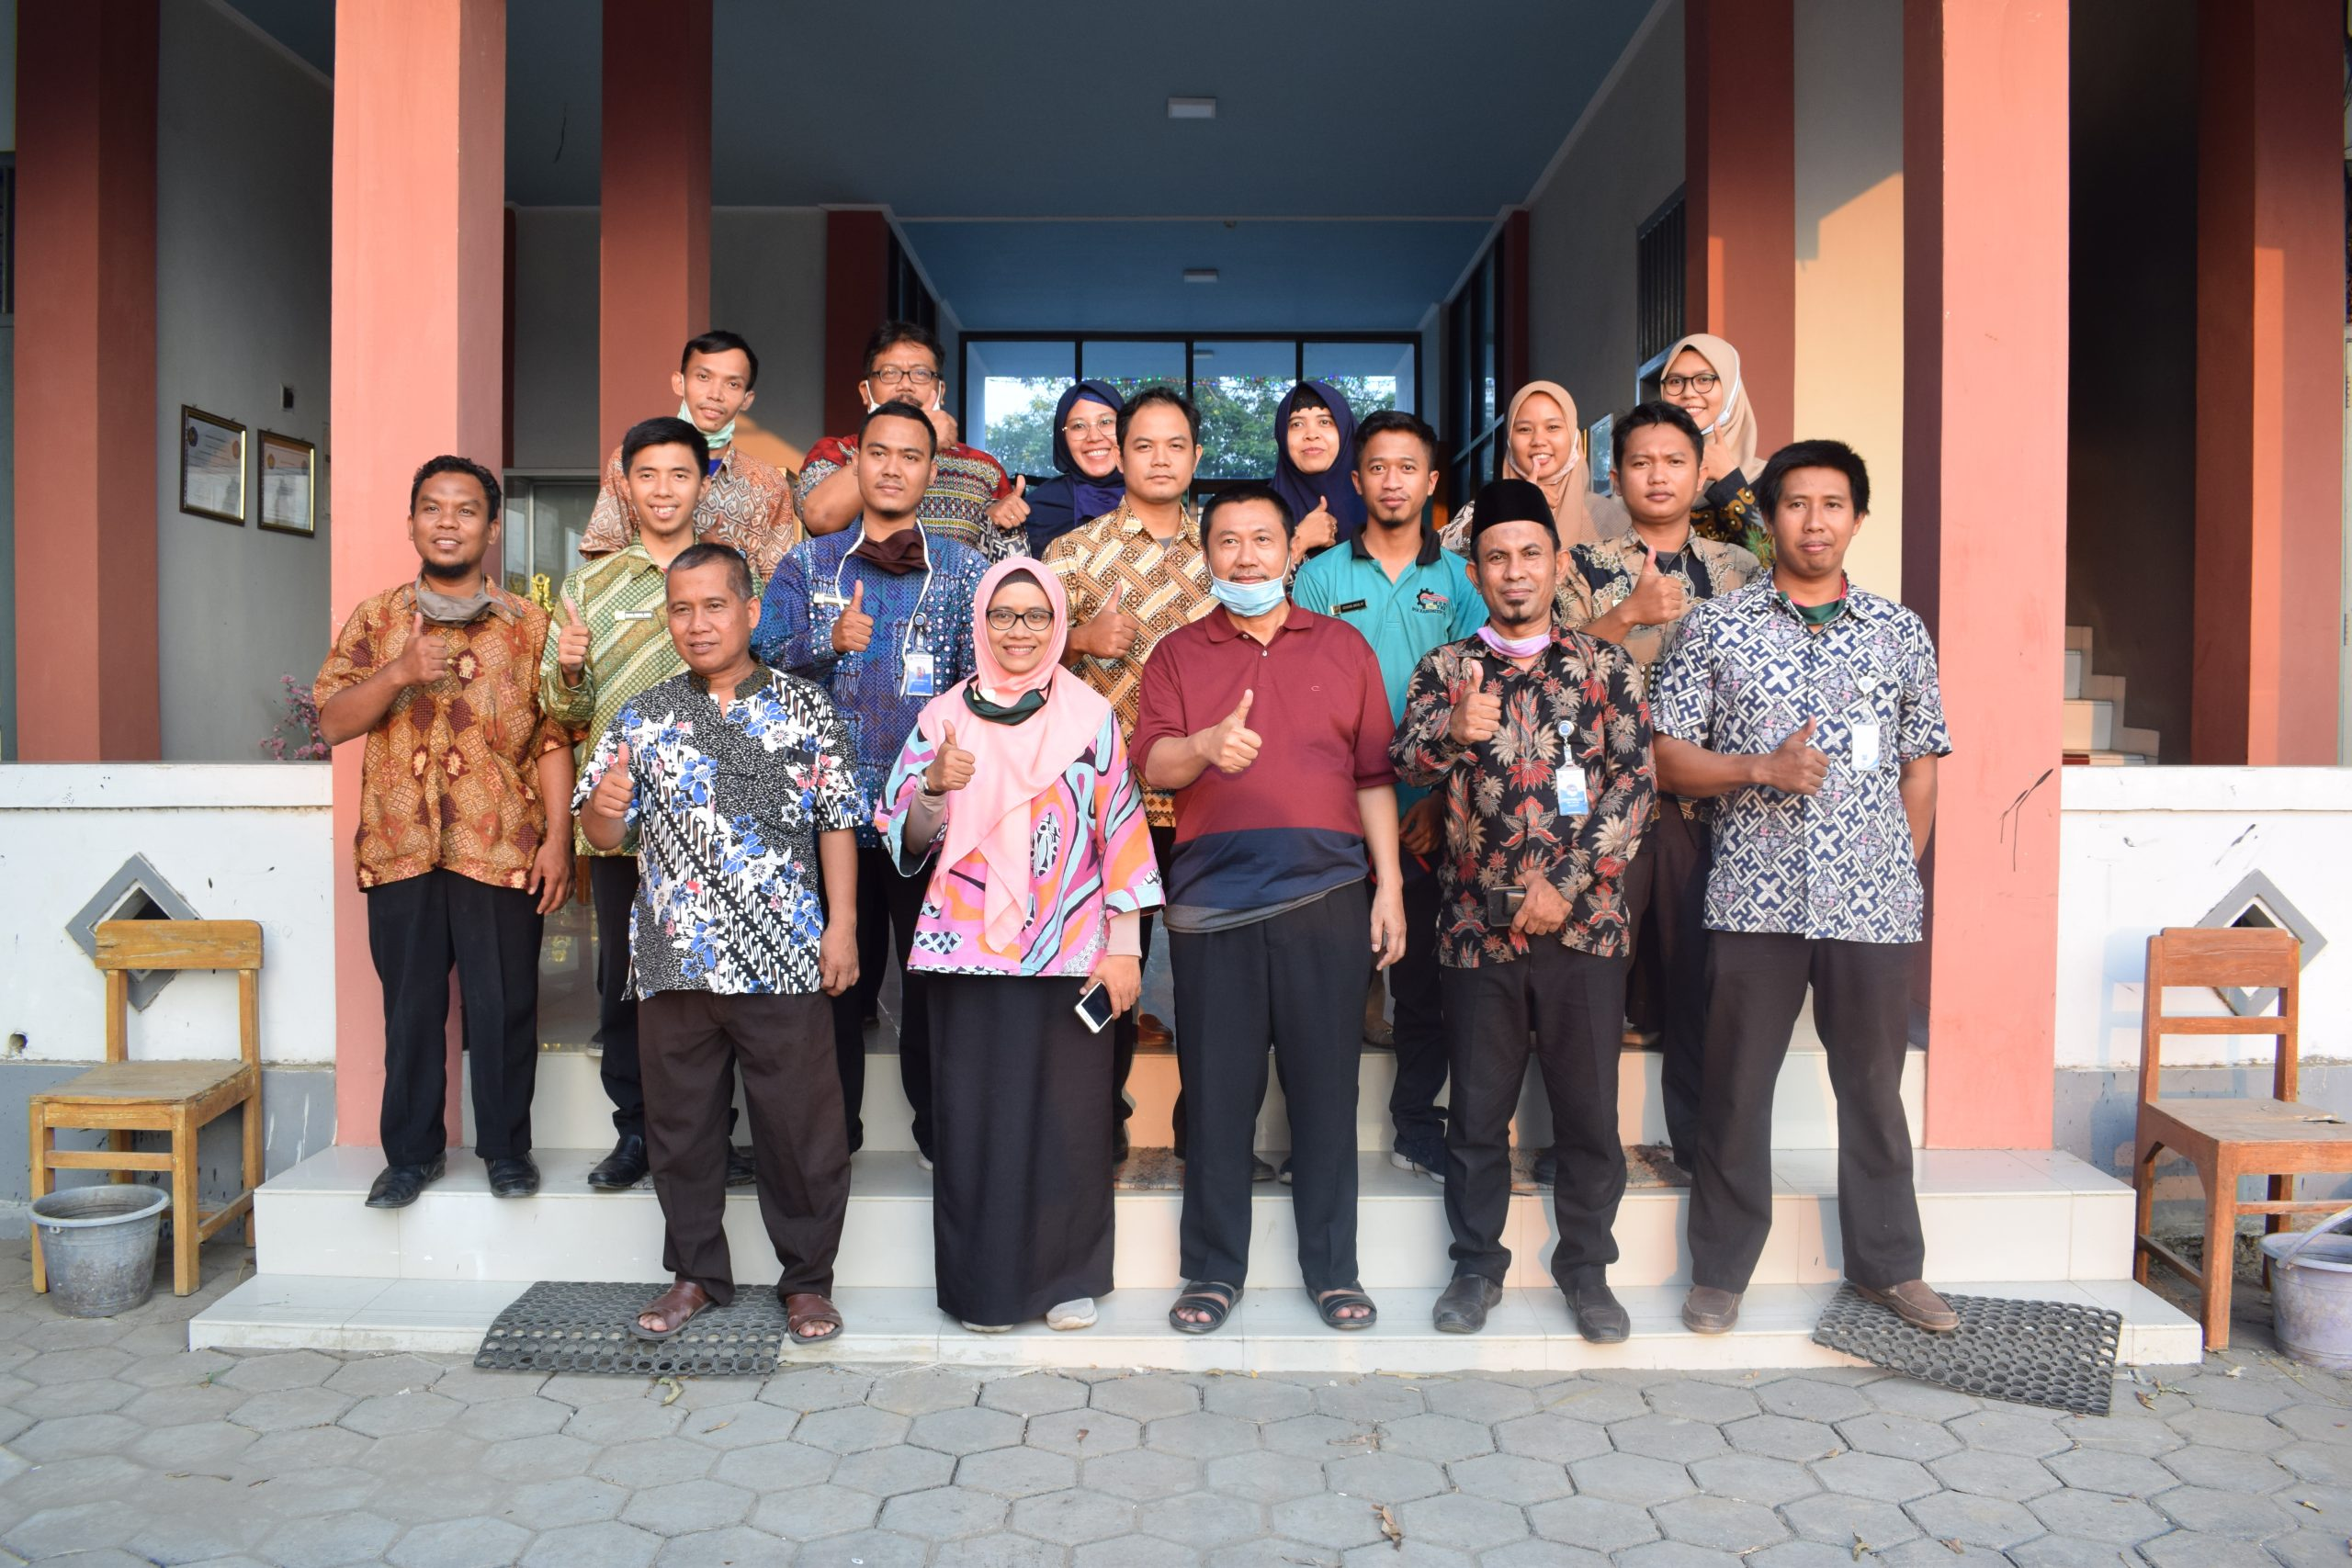 Kunjungan Direktur Pembina SMK Ke SMK Muhammadiyah Adiwerna